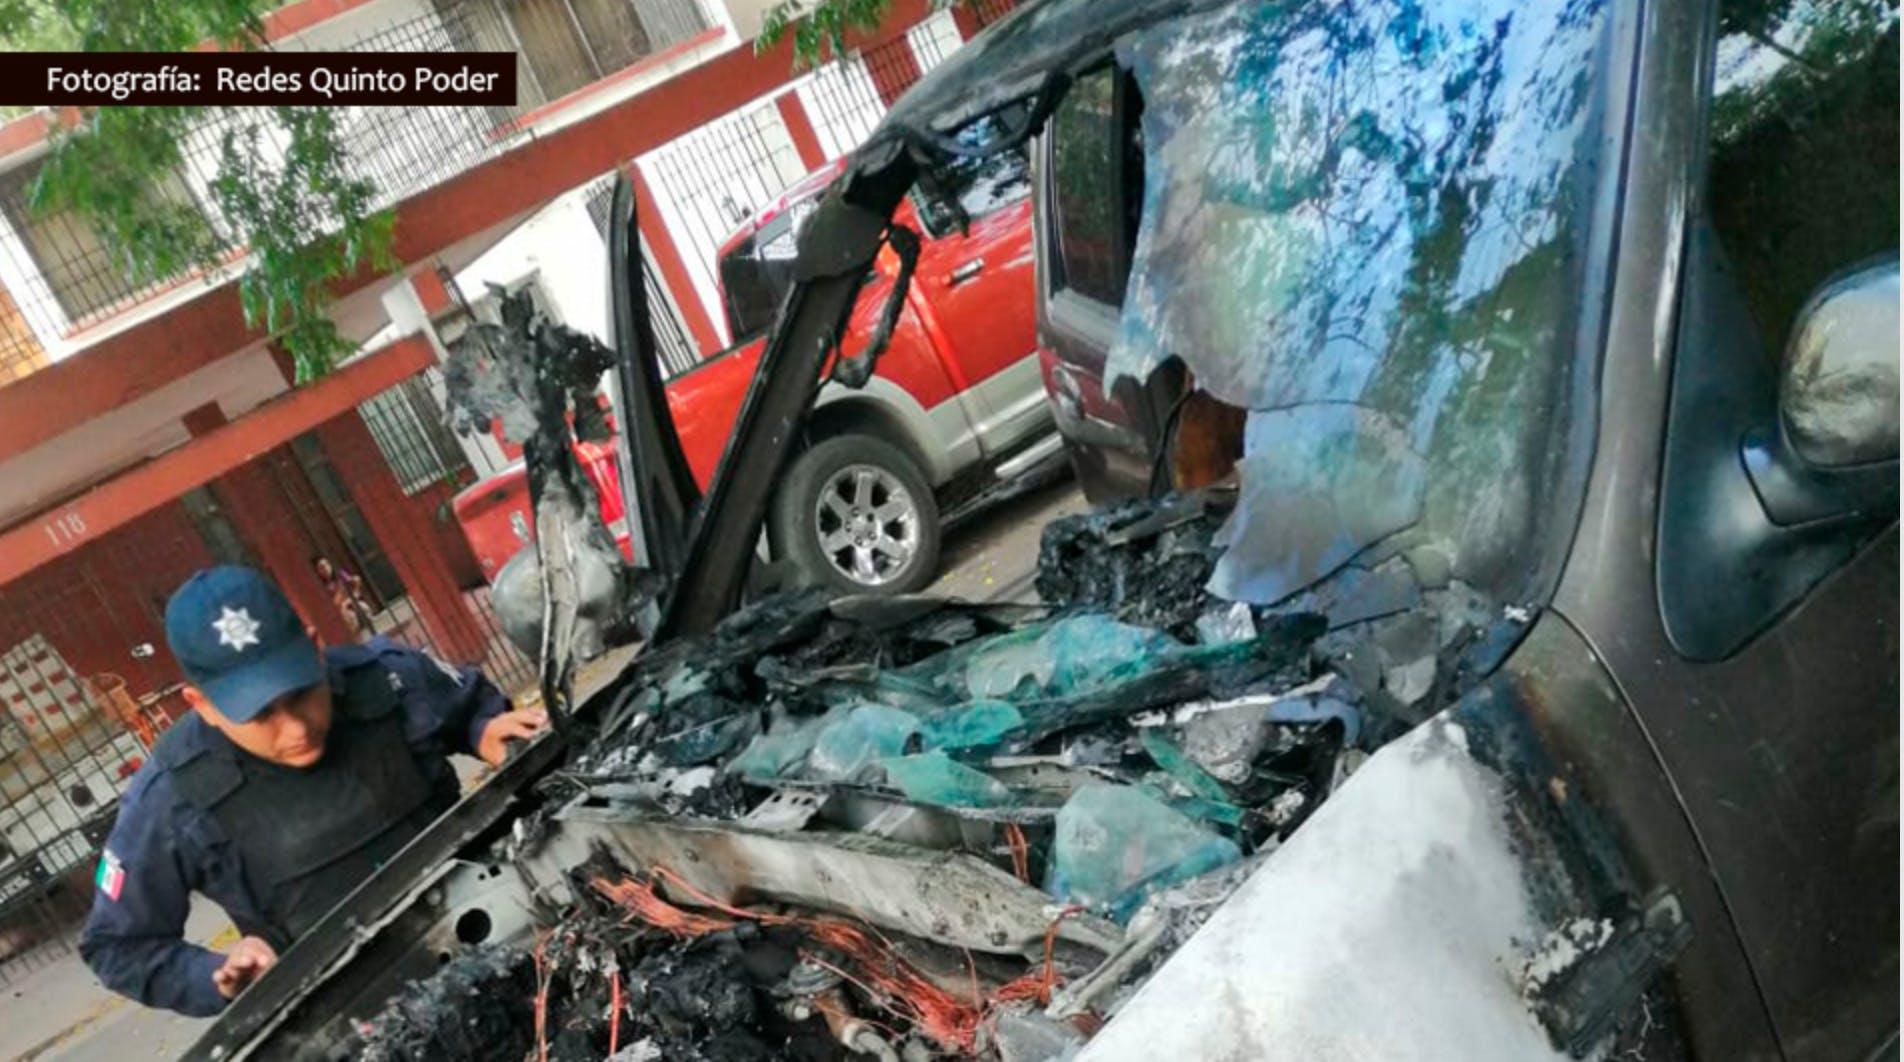 policia revisa un auto incendiado.